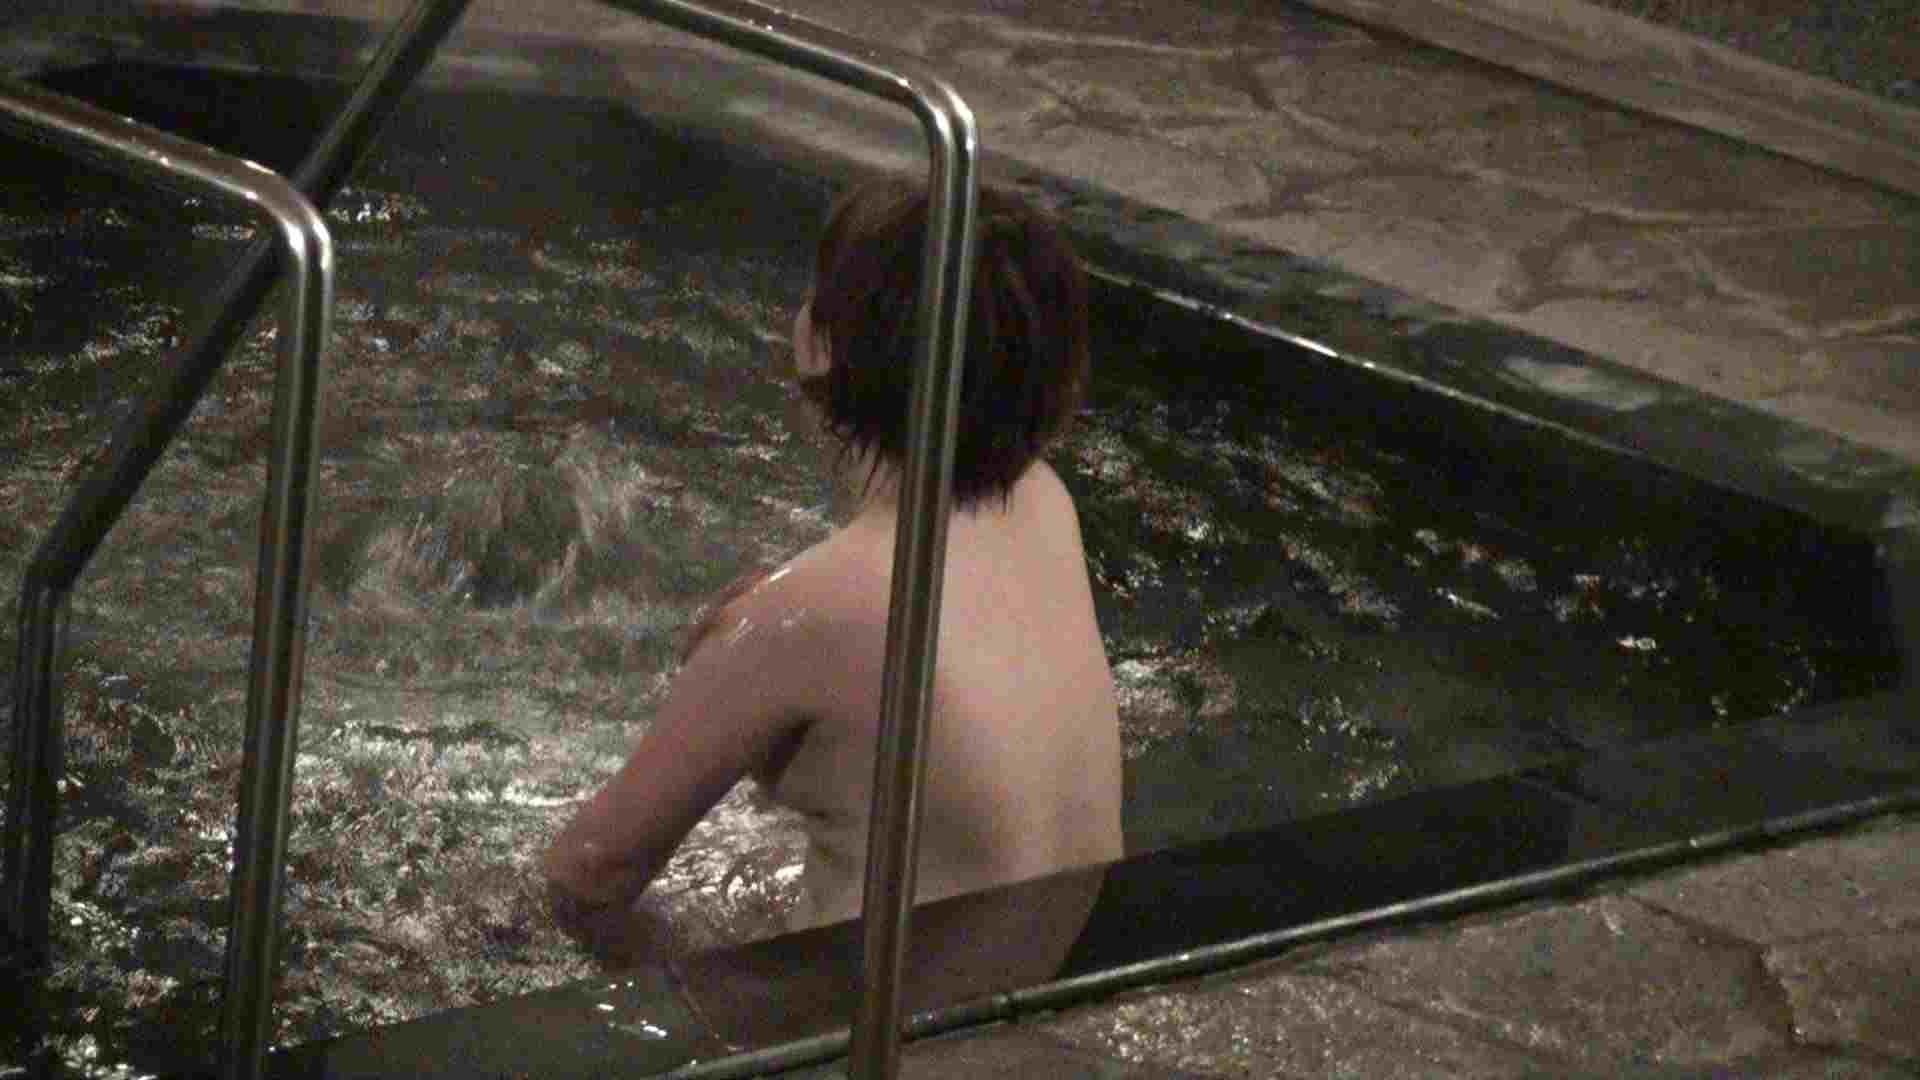 Aquaな露天風呂Vol.432 露天 アダルト動画キャプチャ 86PICs 14